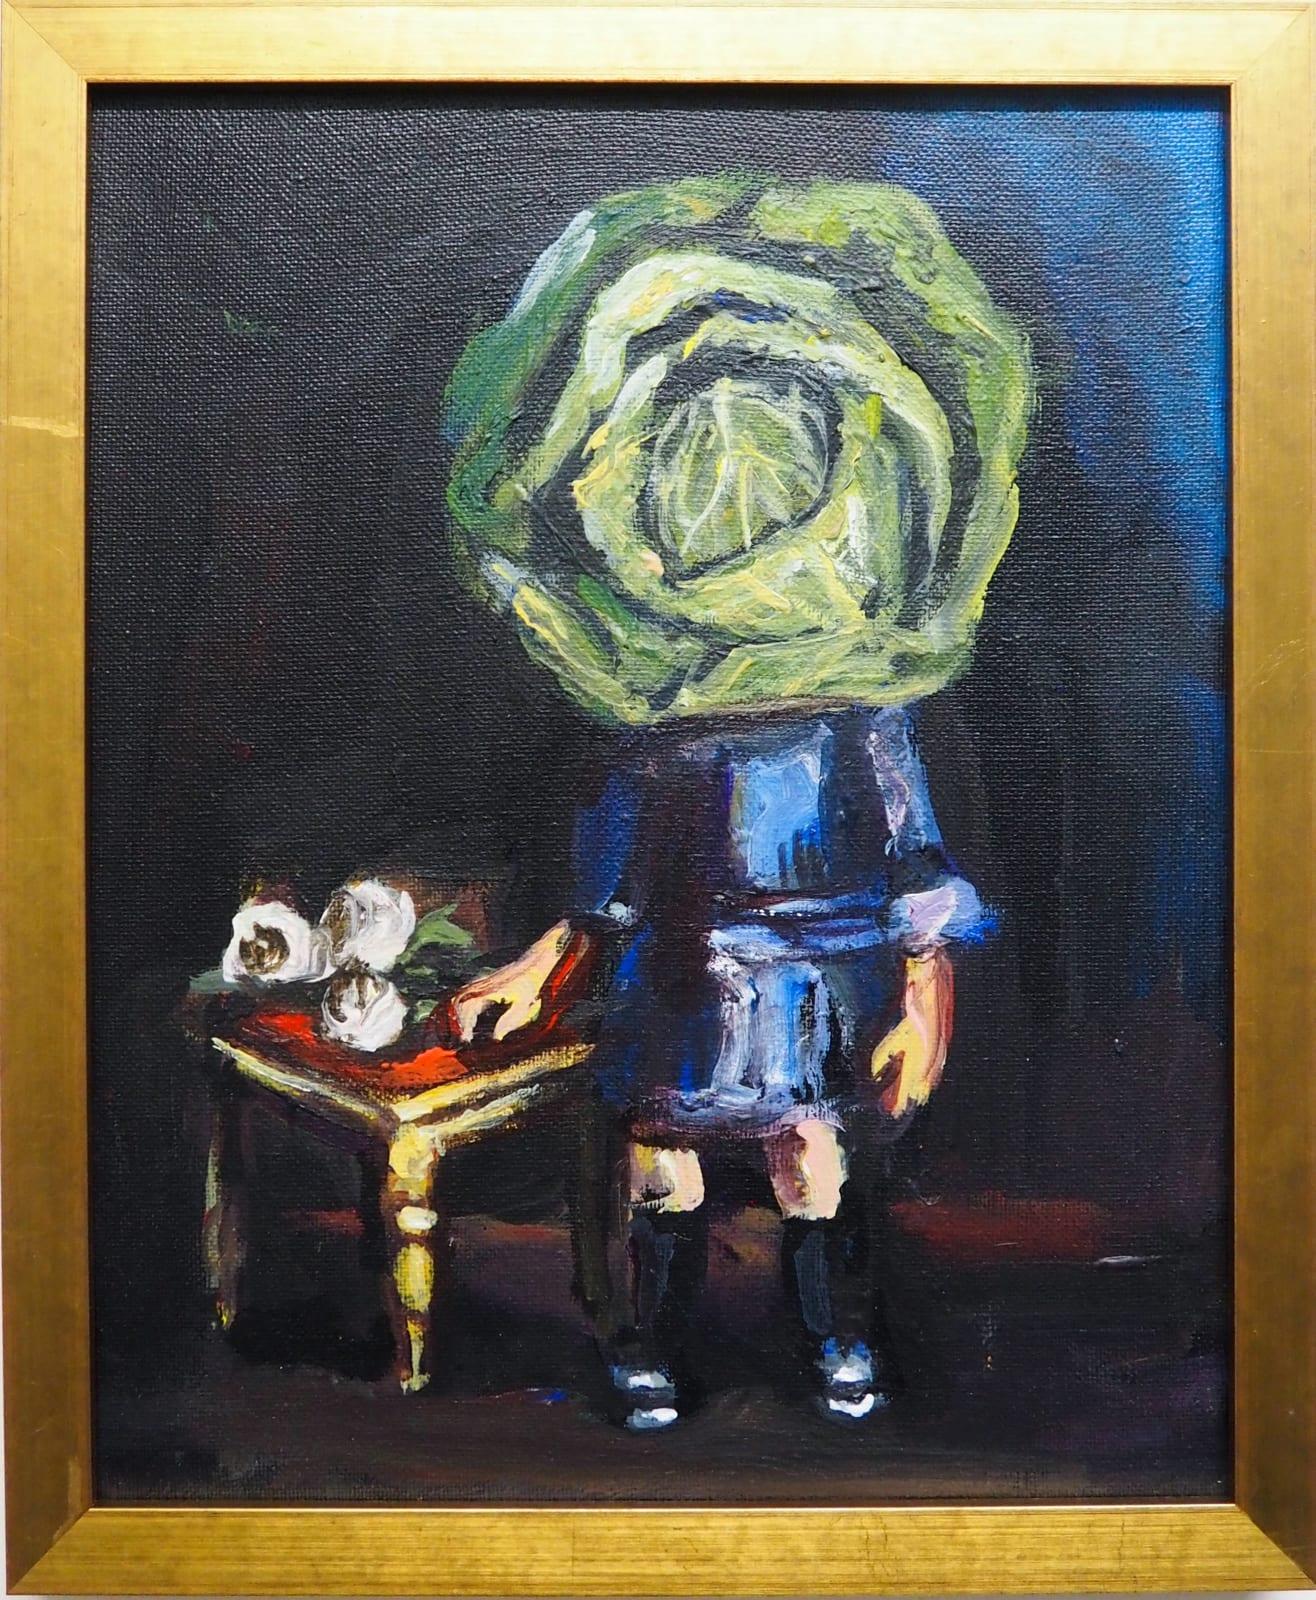 Yassine Balbzioui, chou girl, 2018 Oil on canvas 29.5 x 24.5 cm (framed)